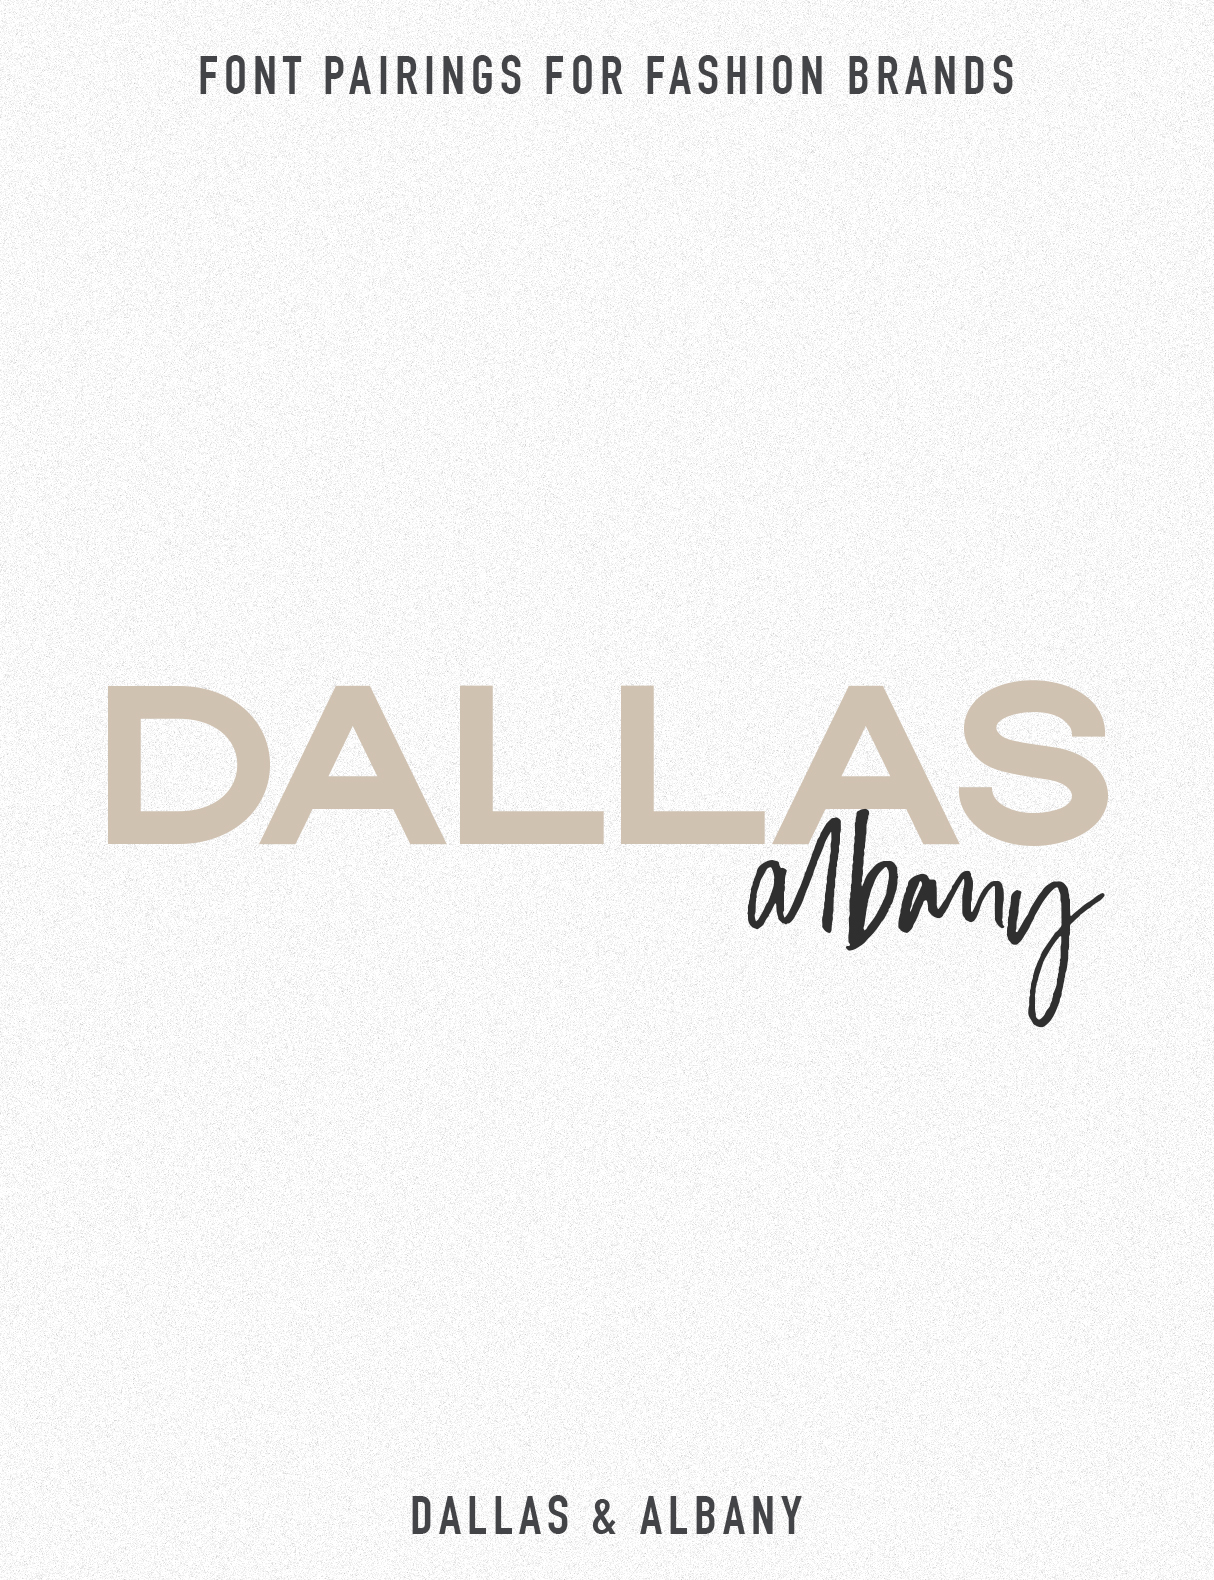 Jen Wagner Fashion Brand Font Pairings | Dallas Albany